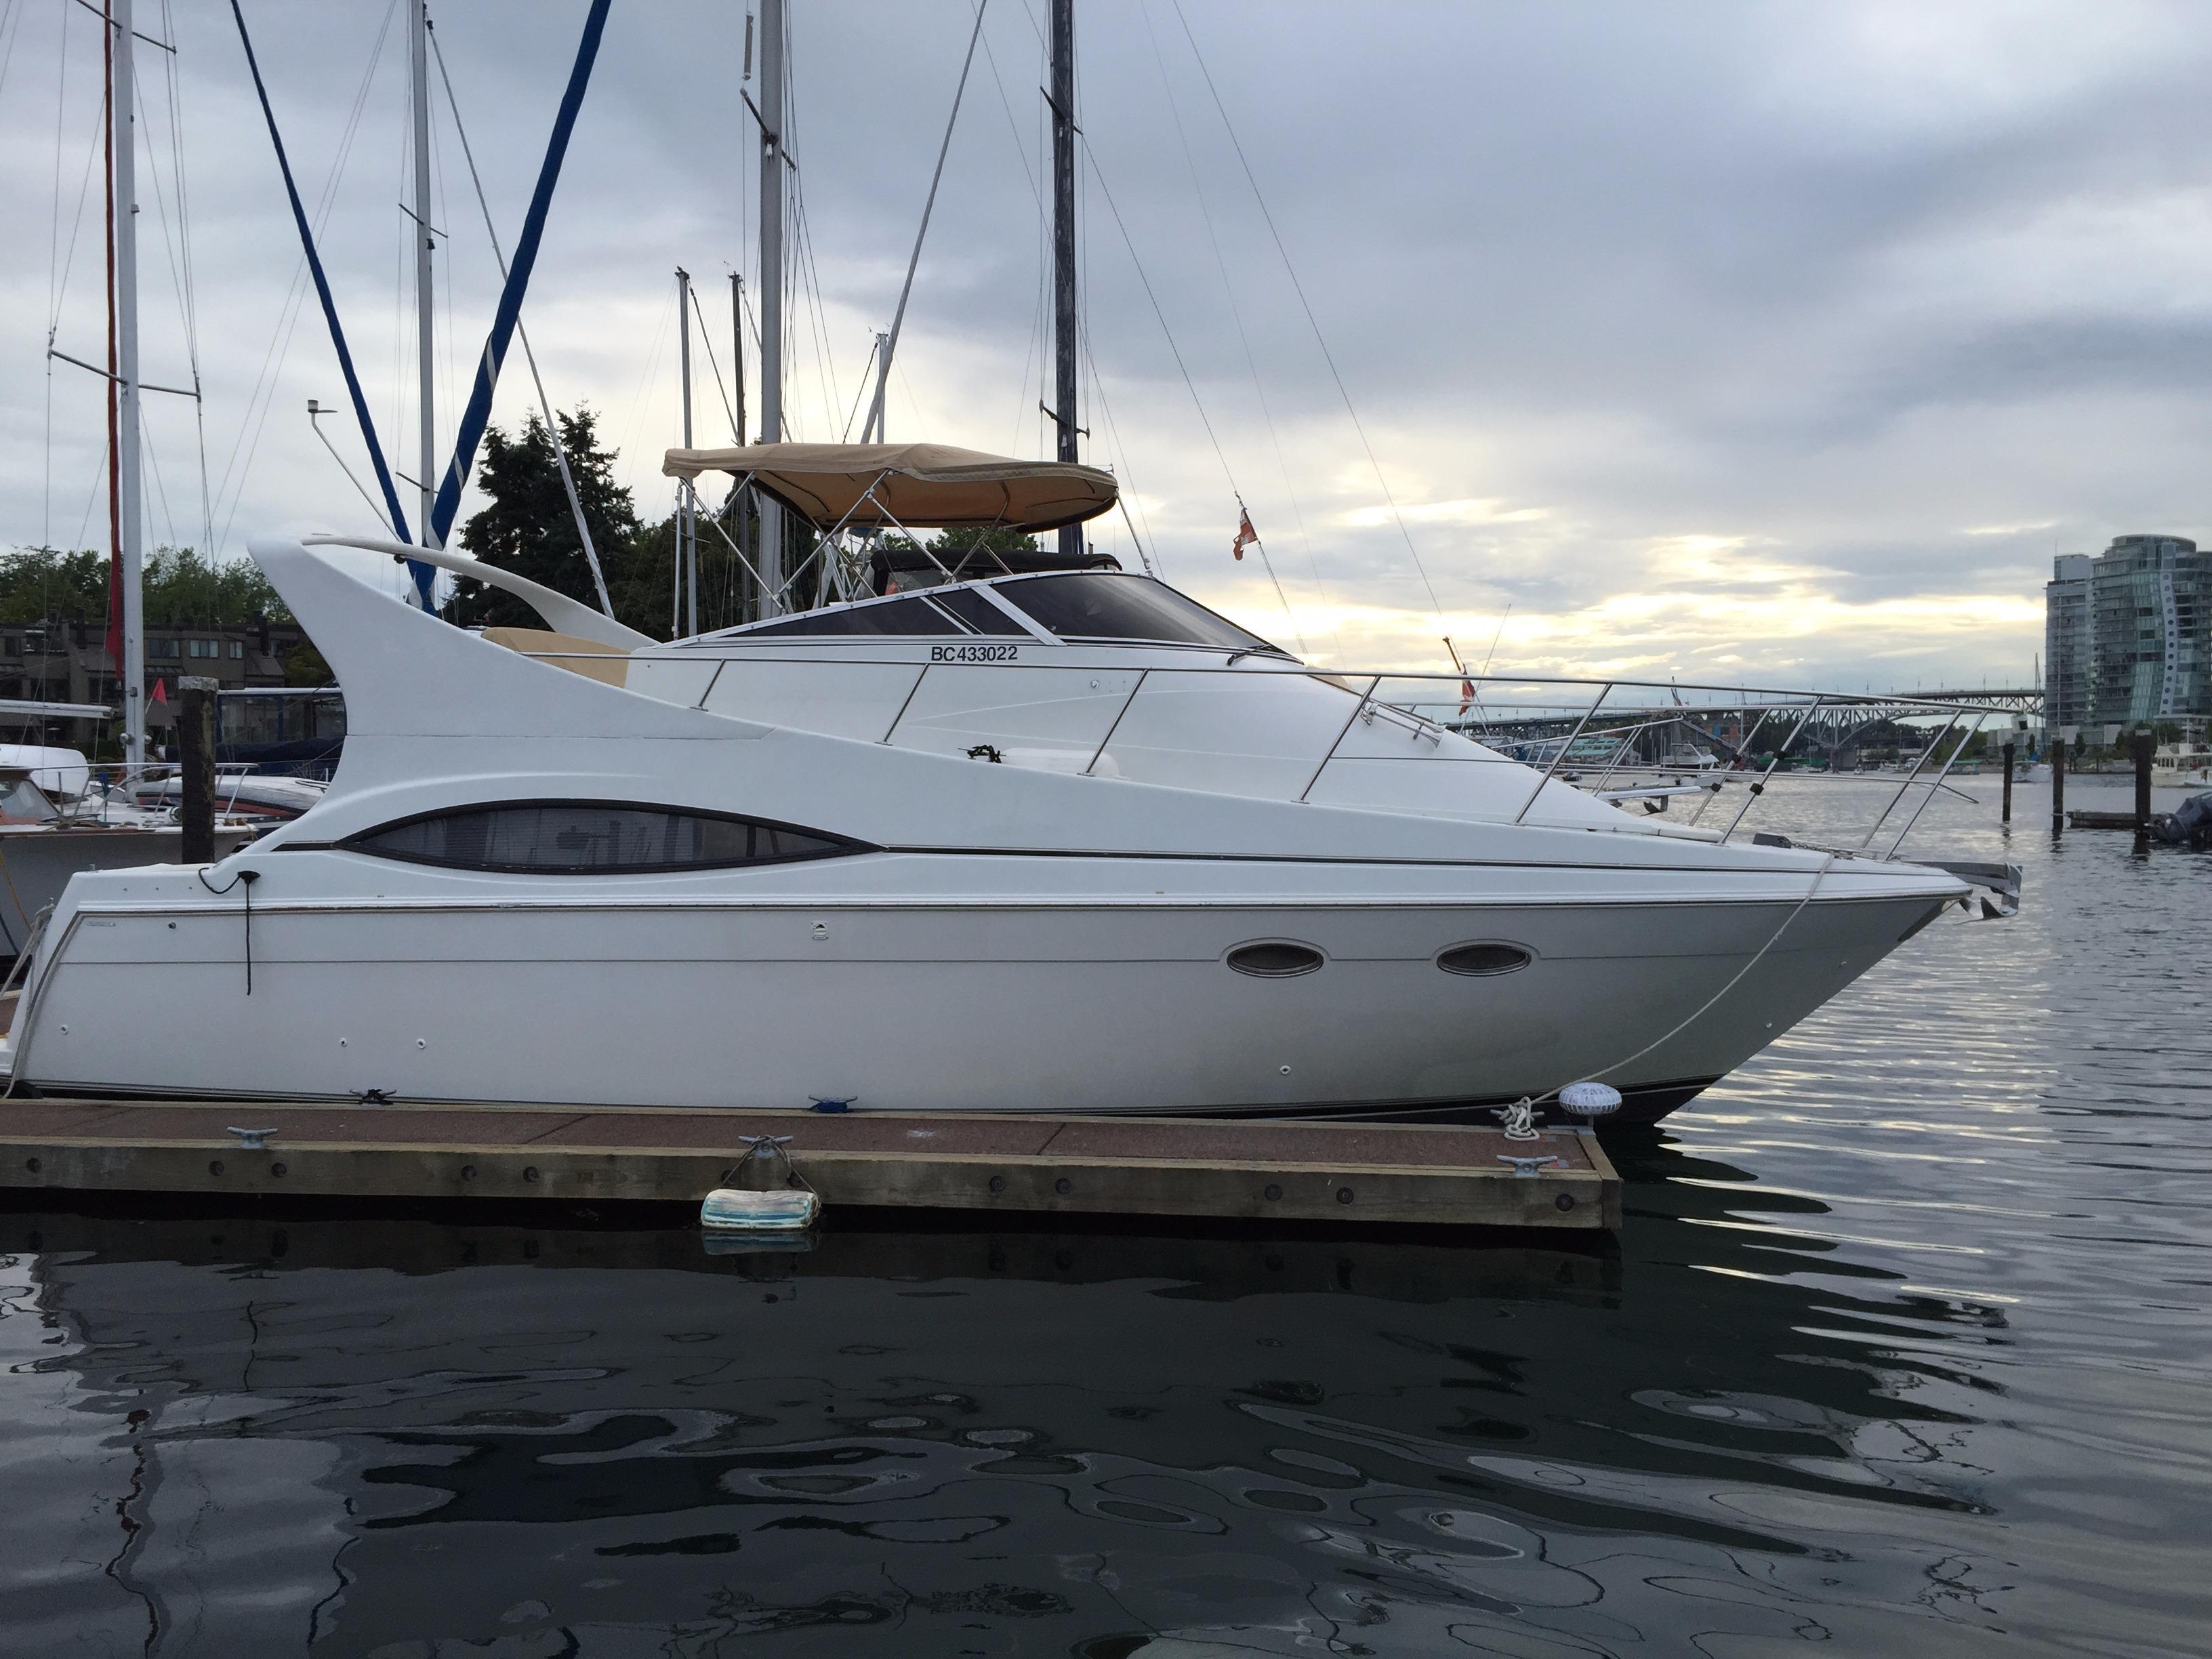 1998 Carver 350 Mariner Power Boat For Sale Www